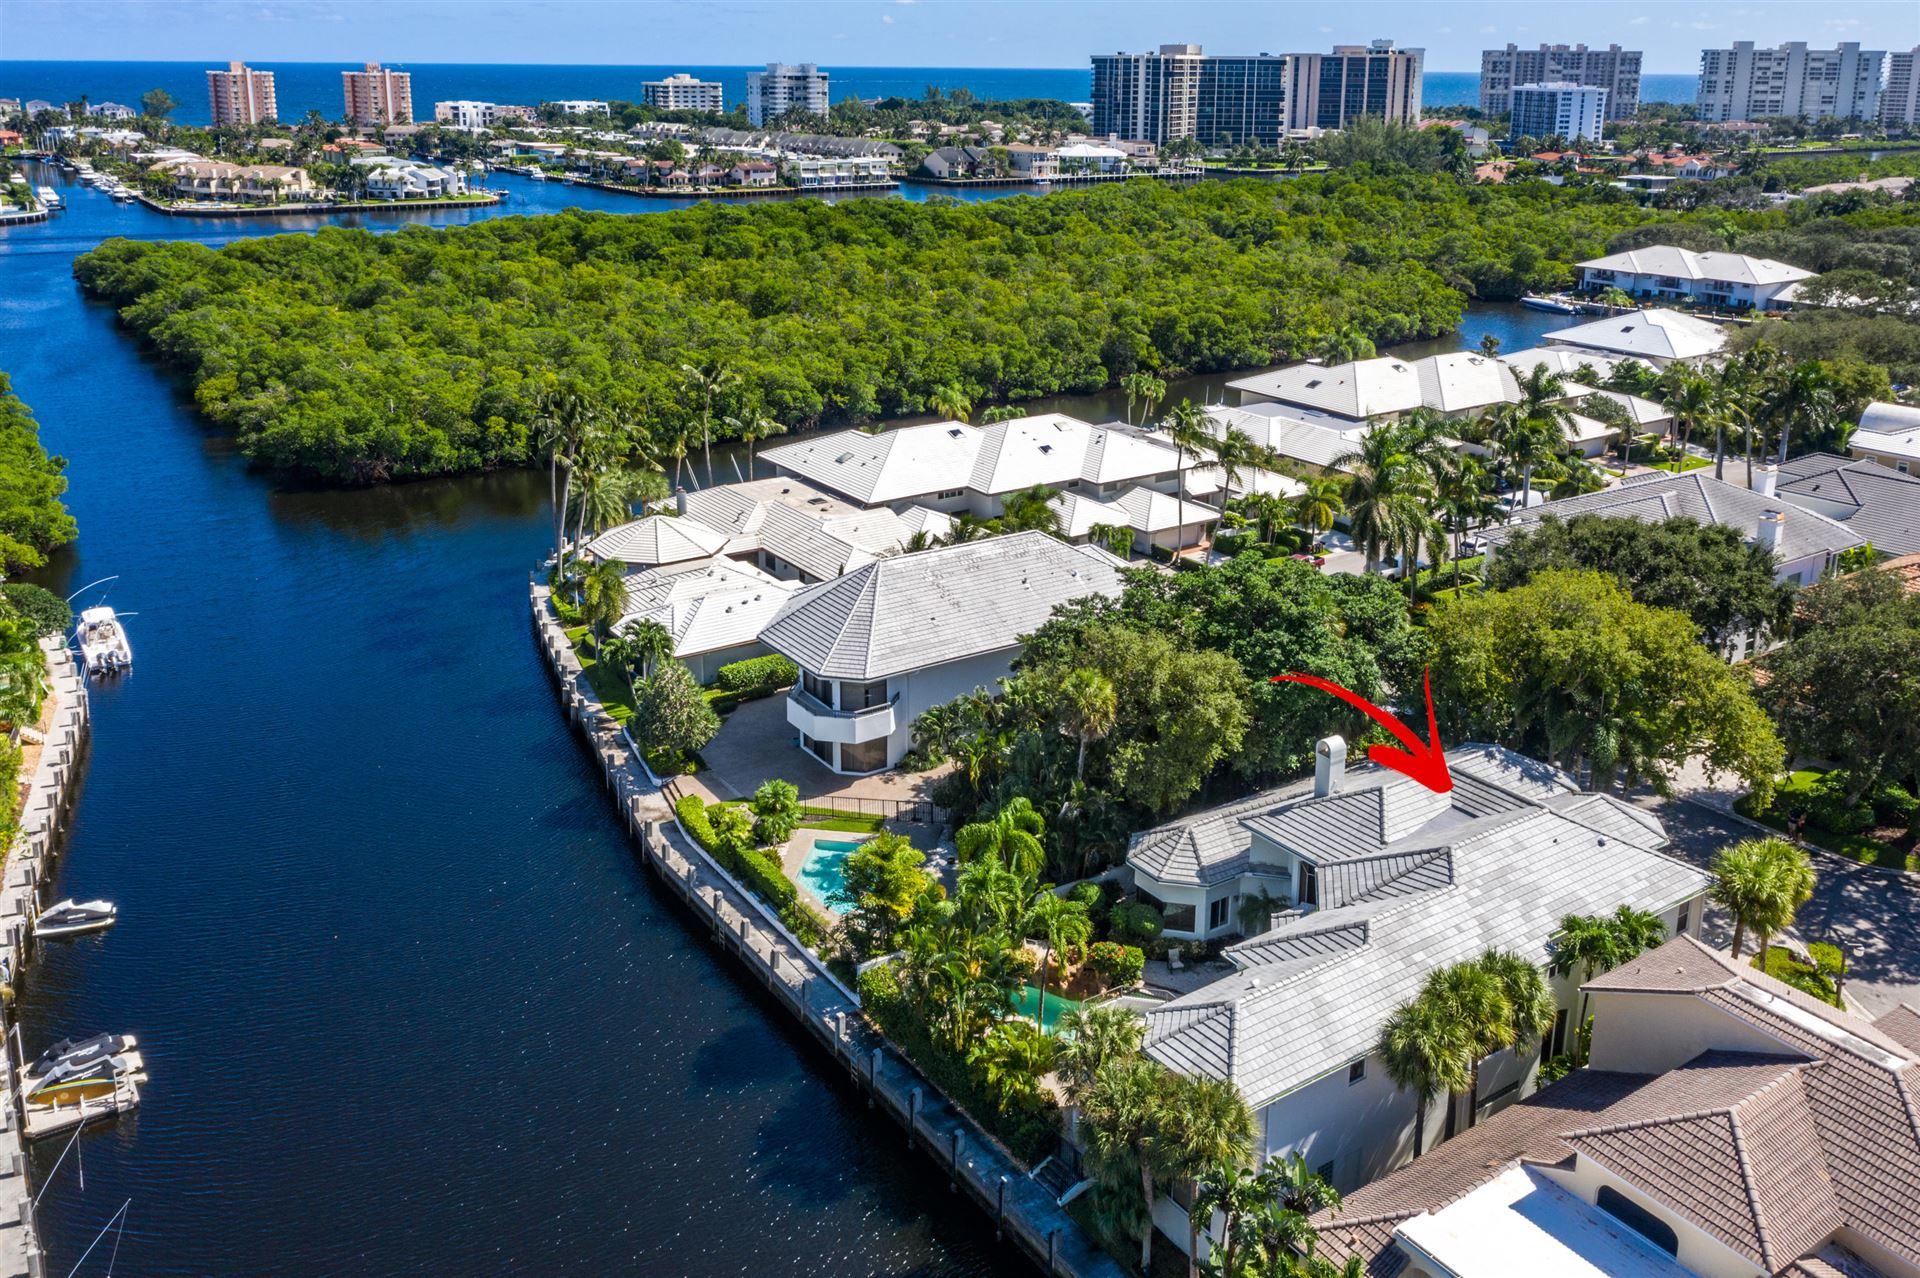 654 Boca Marina Court, Boca Raton, FL 33487 - #: RX-10667104